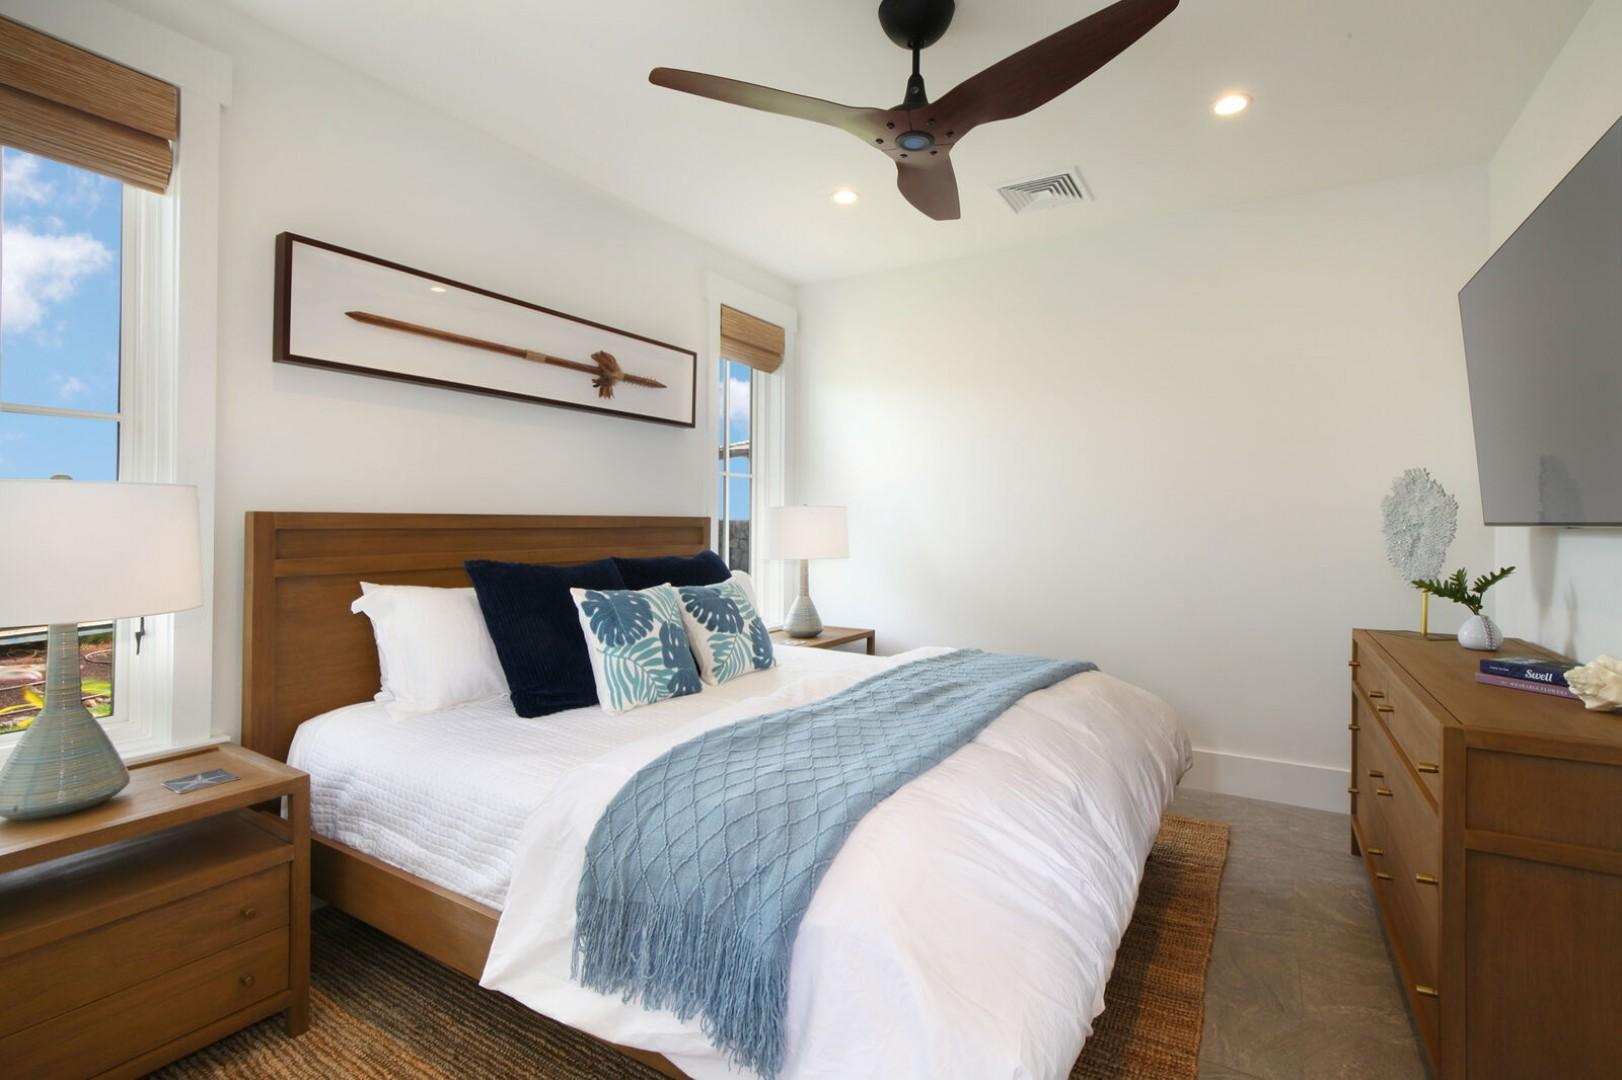 Guest bedroom 3 with ensuite bathroom